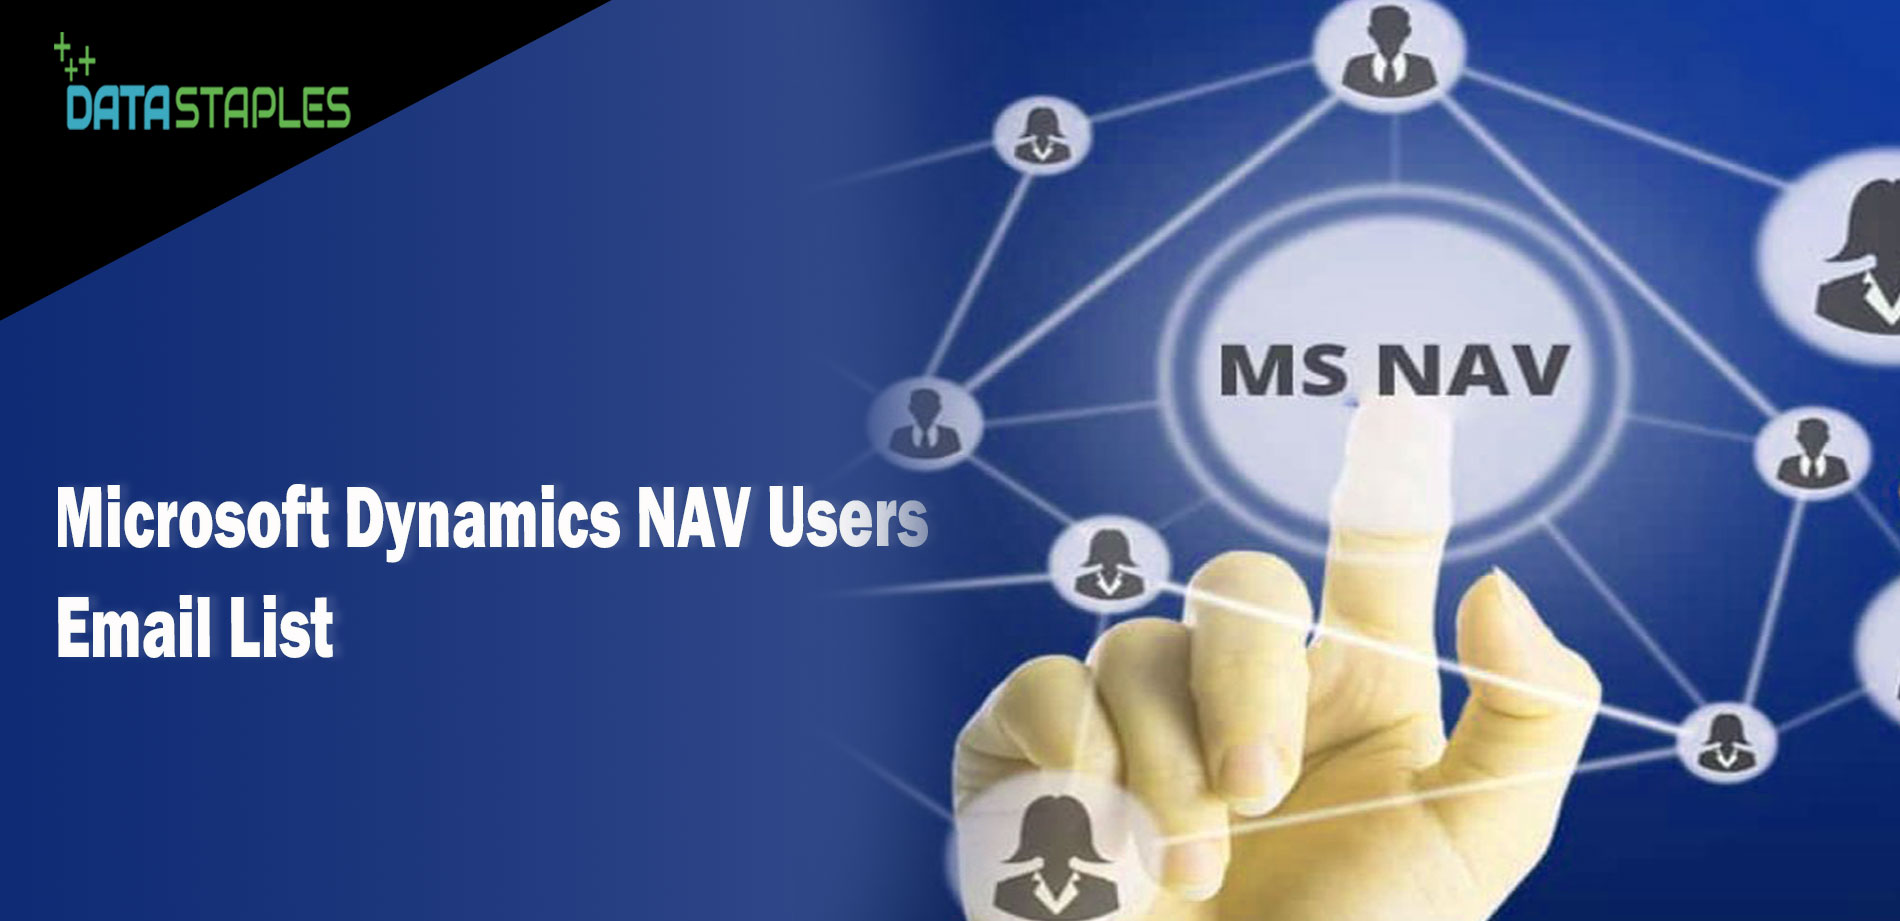 Microsoft Dynamics NAV Users Email List | DataStaples